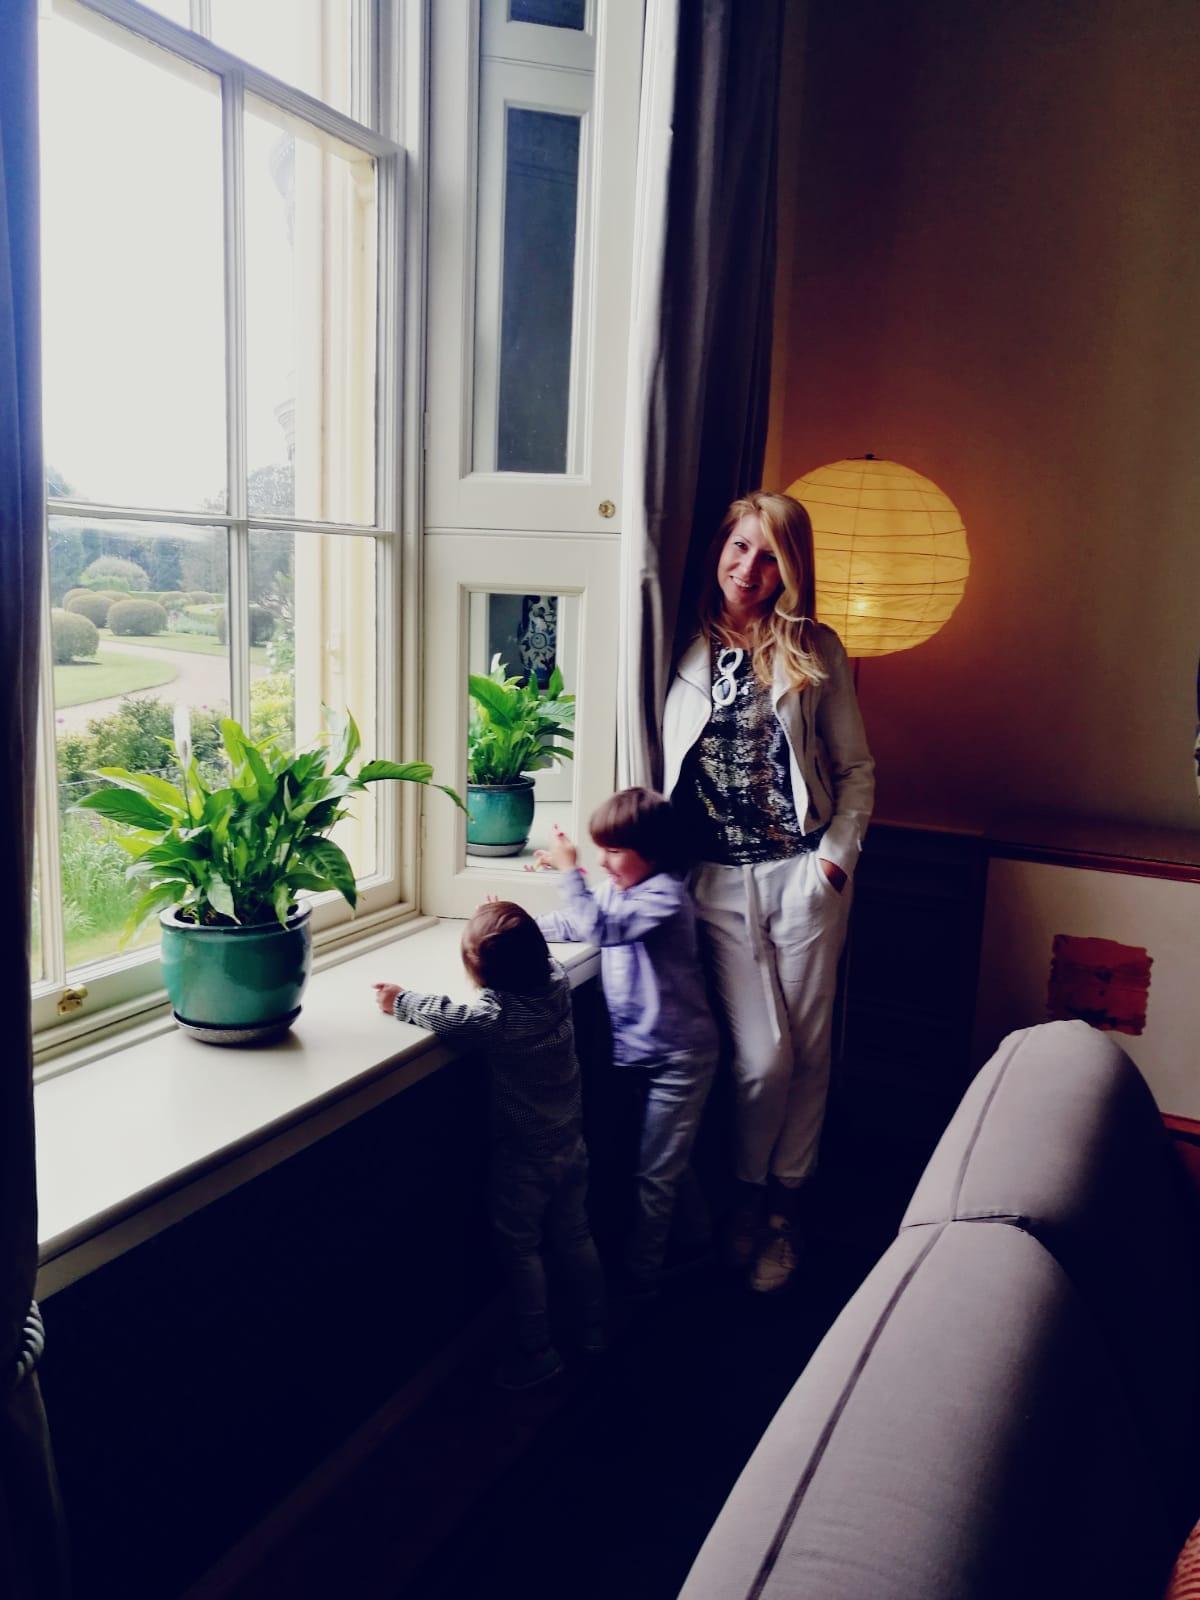 The Ickworth Hotel